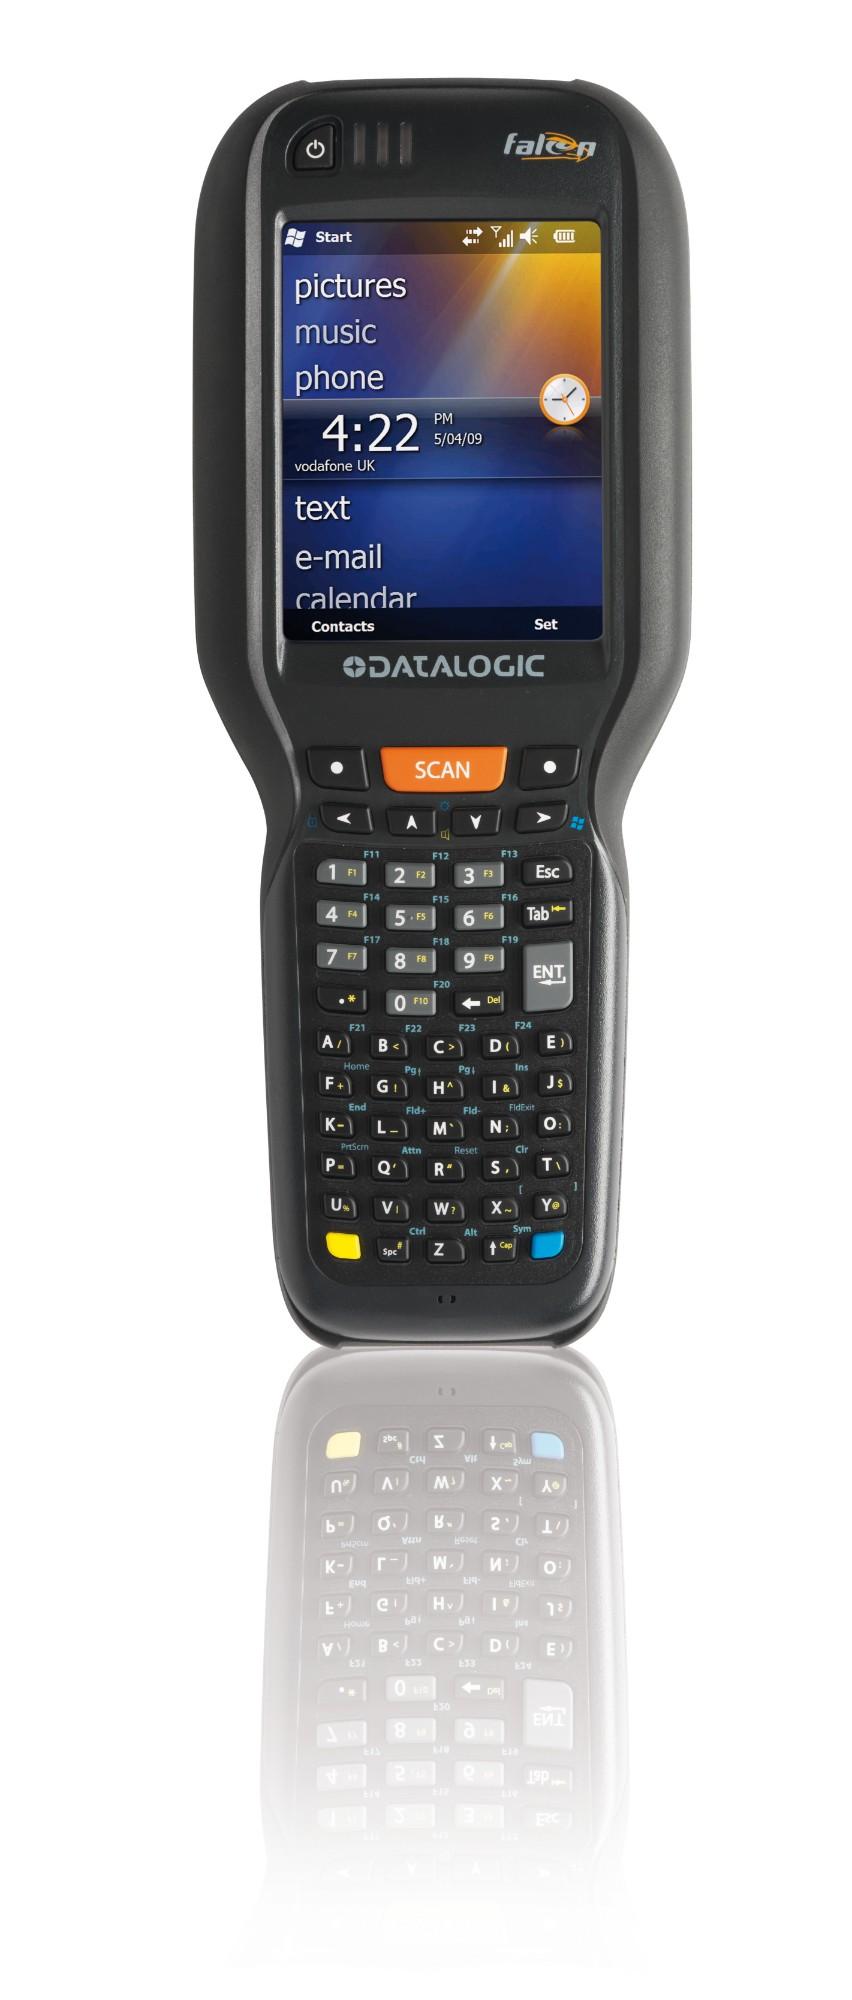 "Datalogic Falcon X3+ ordenador móvil industrial 8,89 cm (3.5"") 640 x 480 Pixeles Pantalla táctil 674 g Negro"